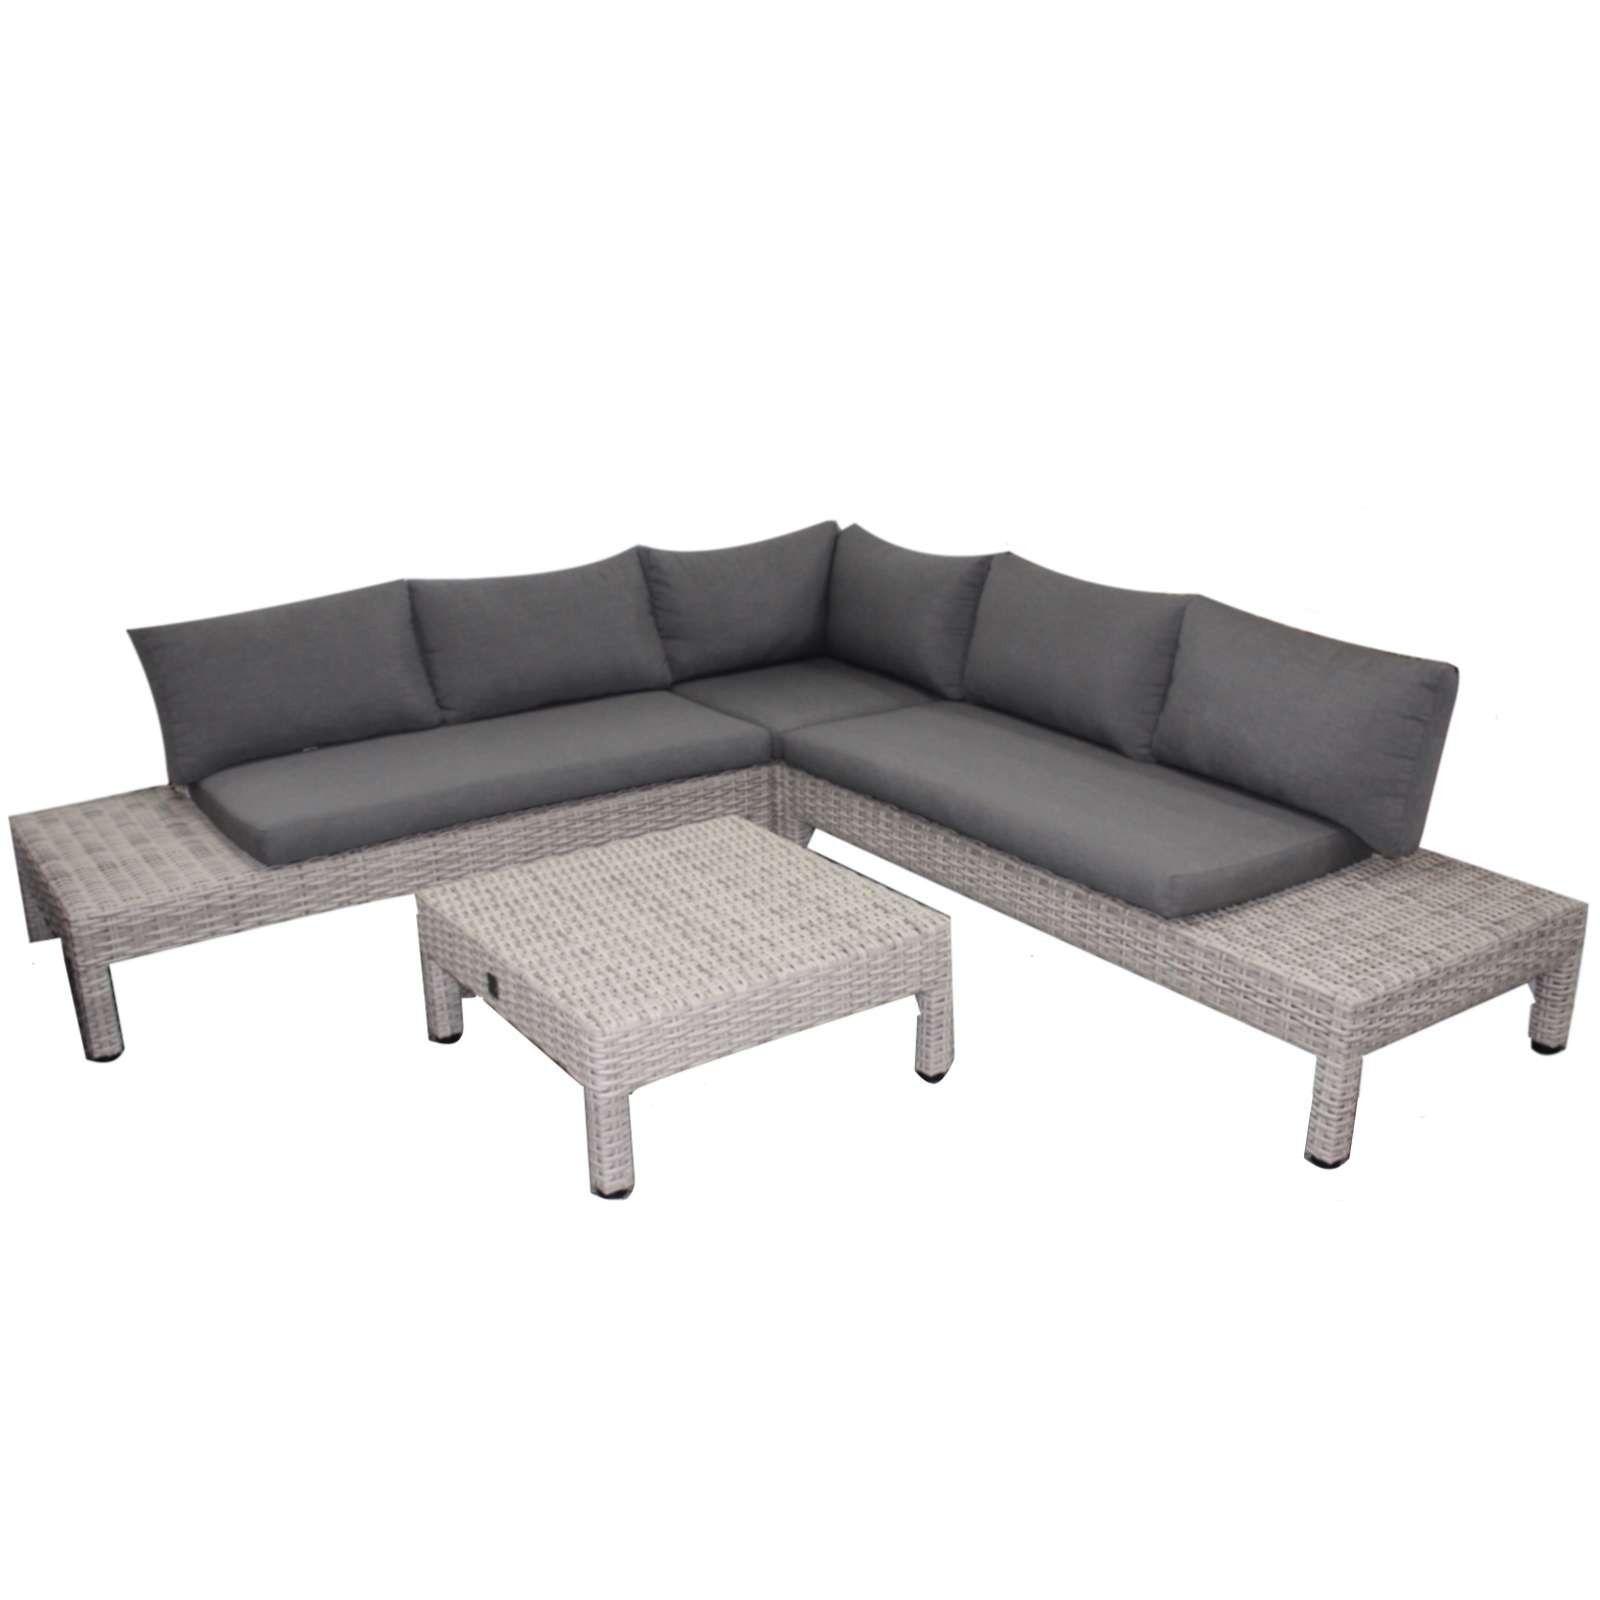 Aqua Saar Chios 4 Teiliges Loungeset Polyrattan Frost Lounge Mobel Gartenmobel Polyrattan